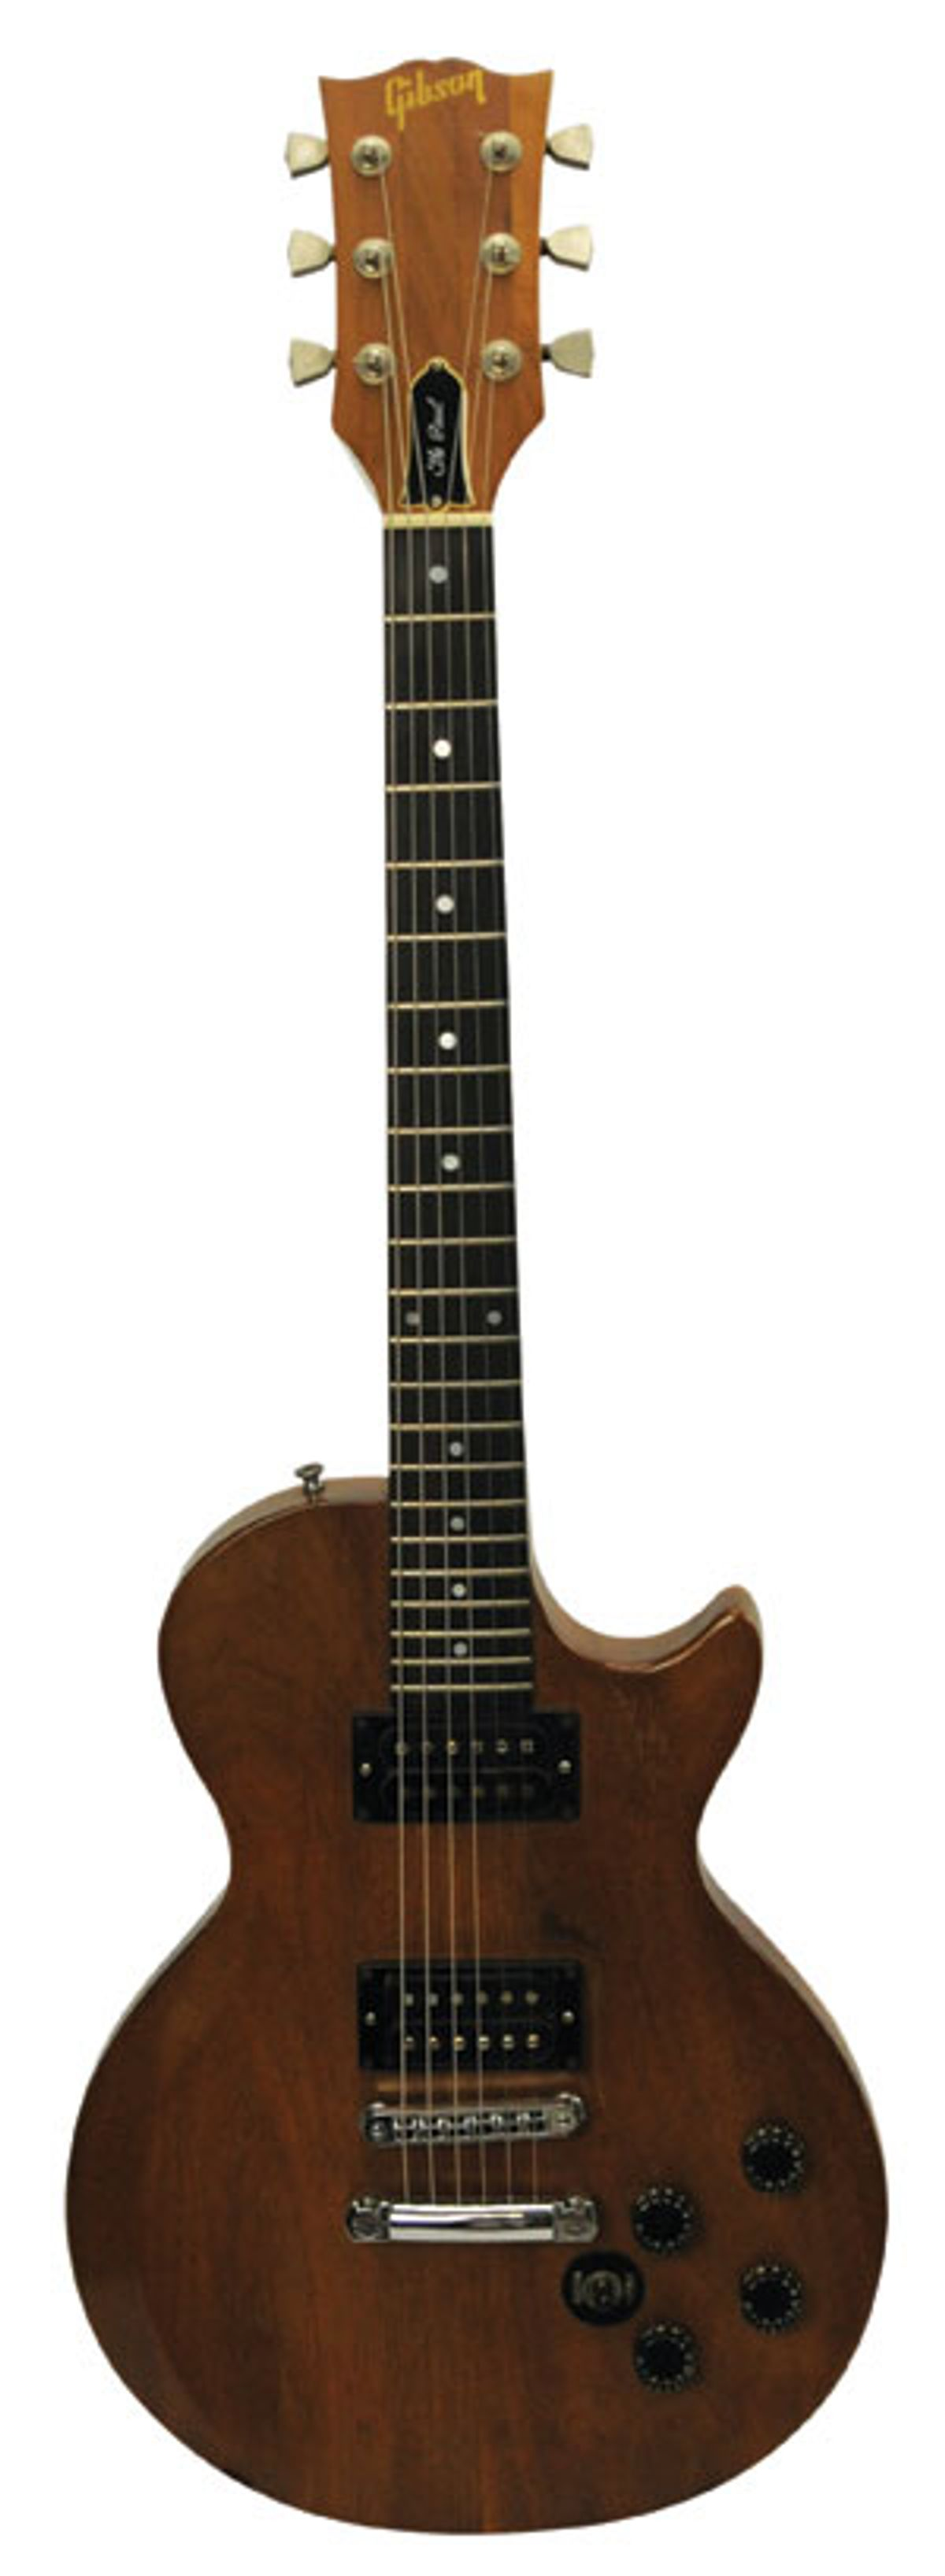 1978 Gibson The Paul (Standard)